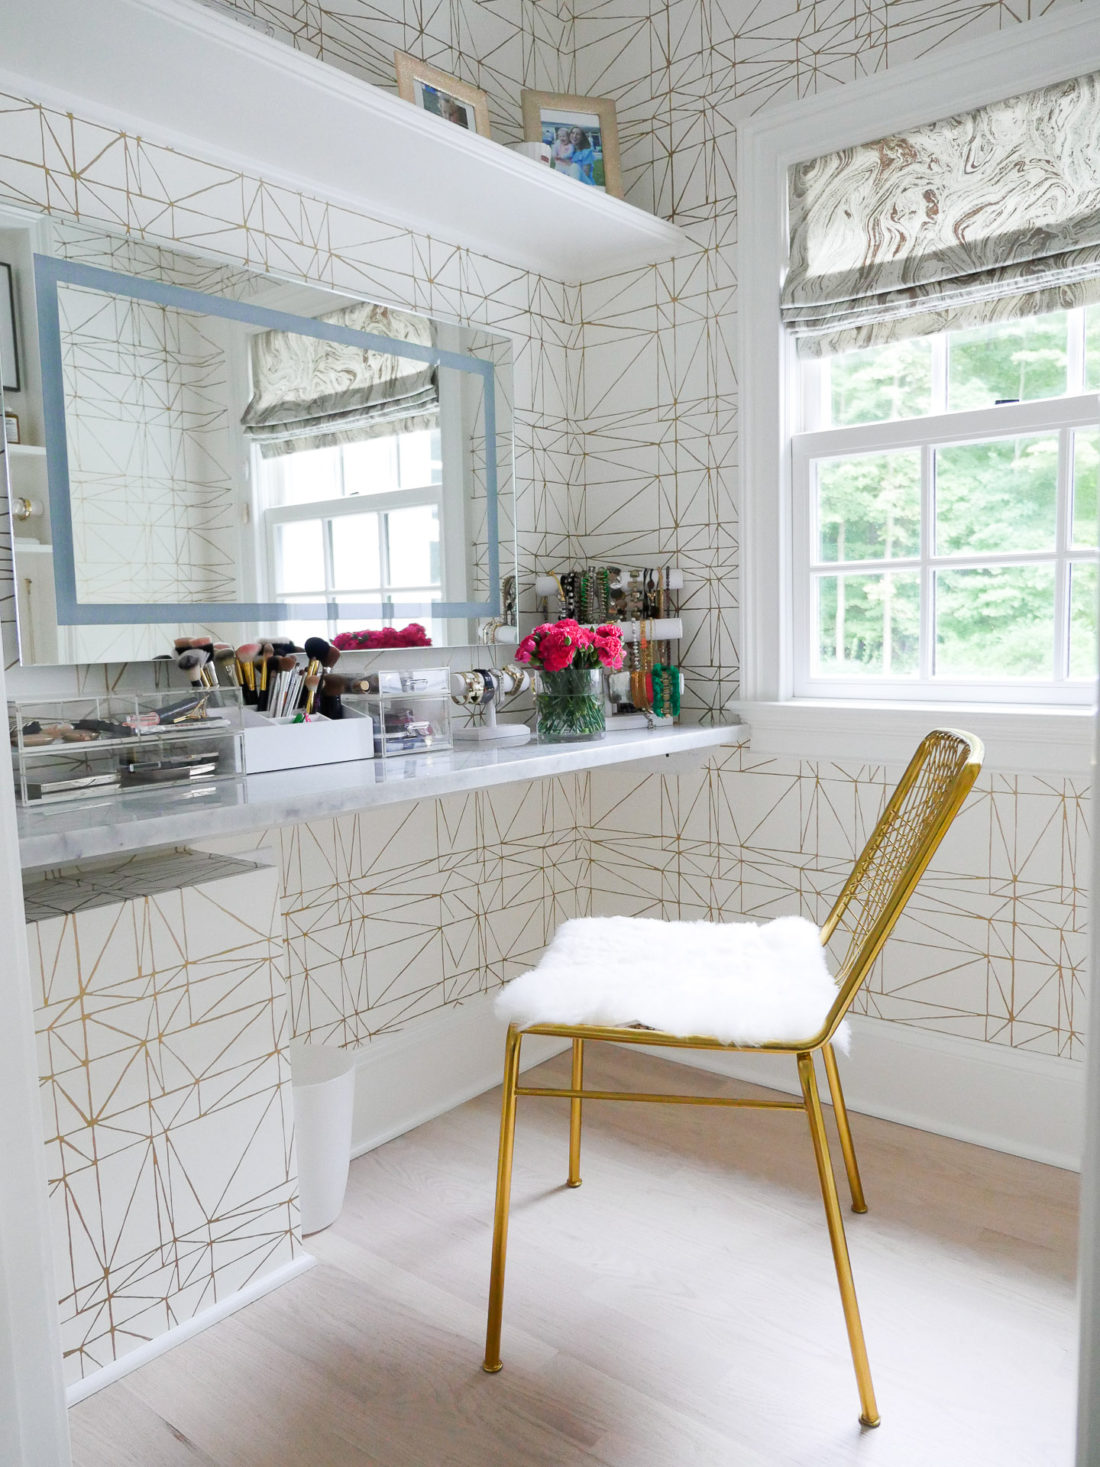 Eva Amurri Martino's ultra-feminine glam room featuring a gold motif